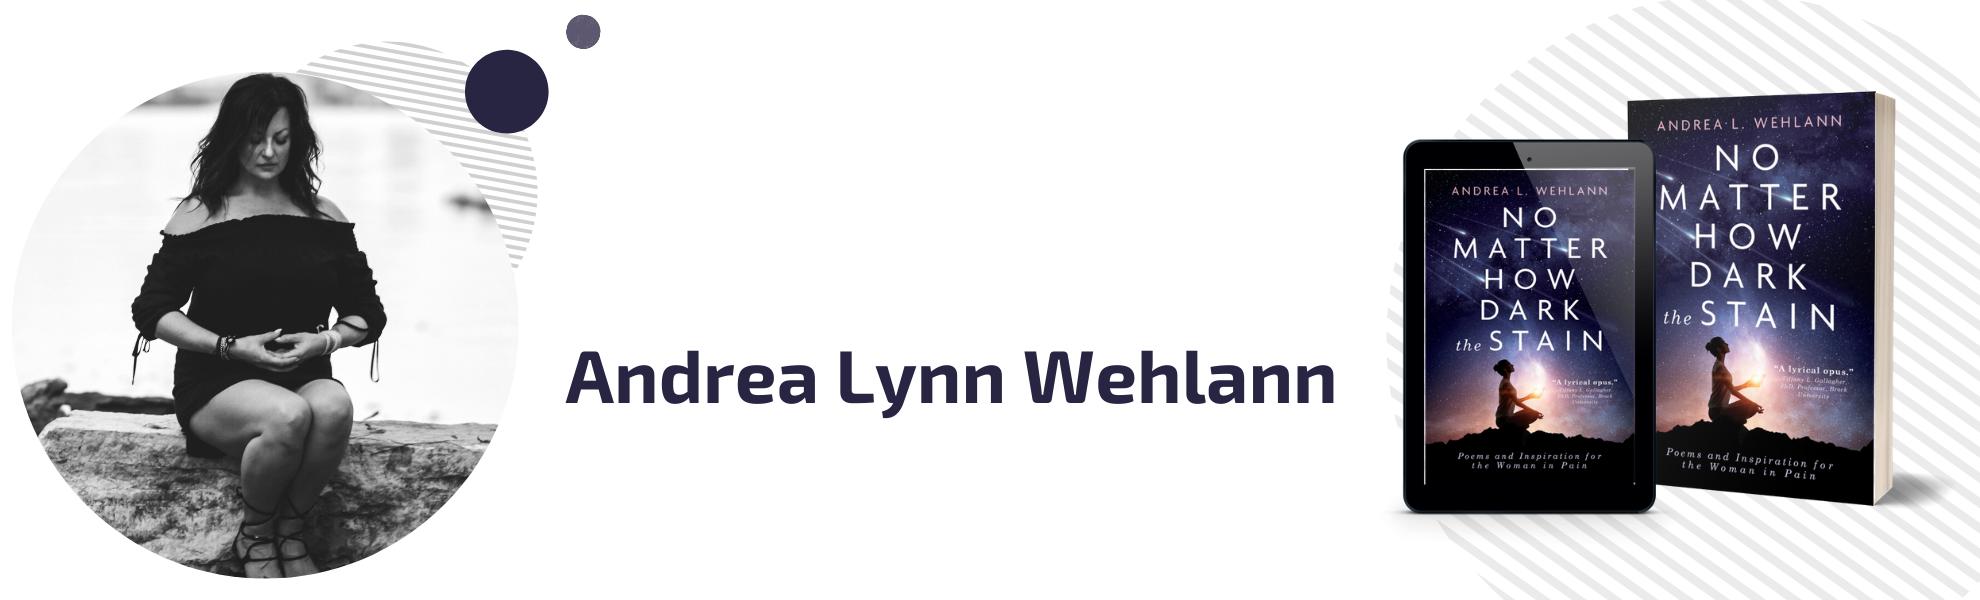 Andrea Lynn Wehlann